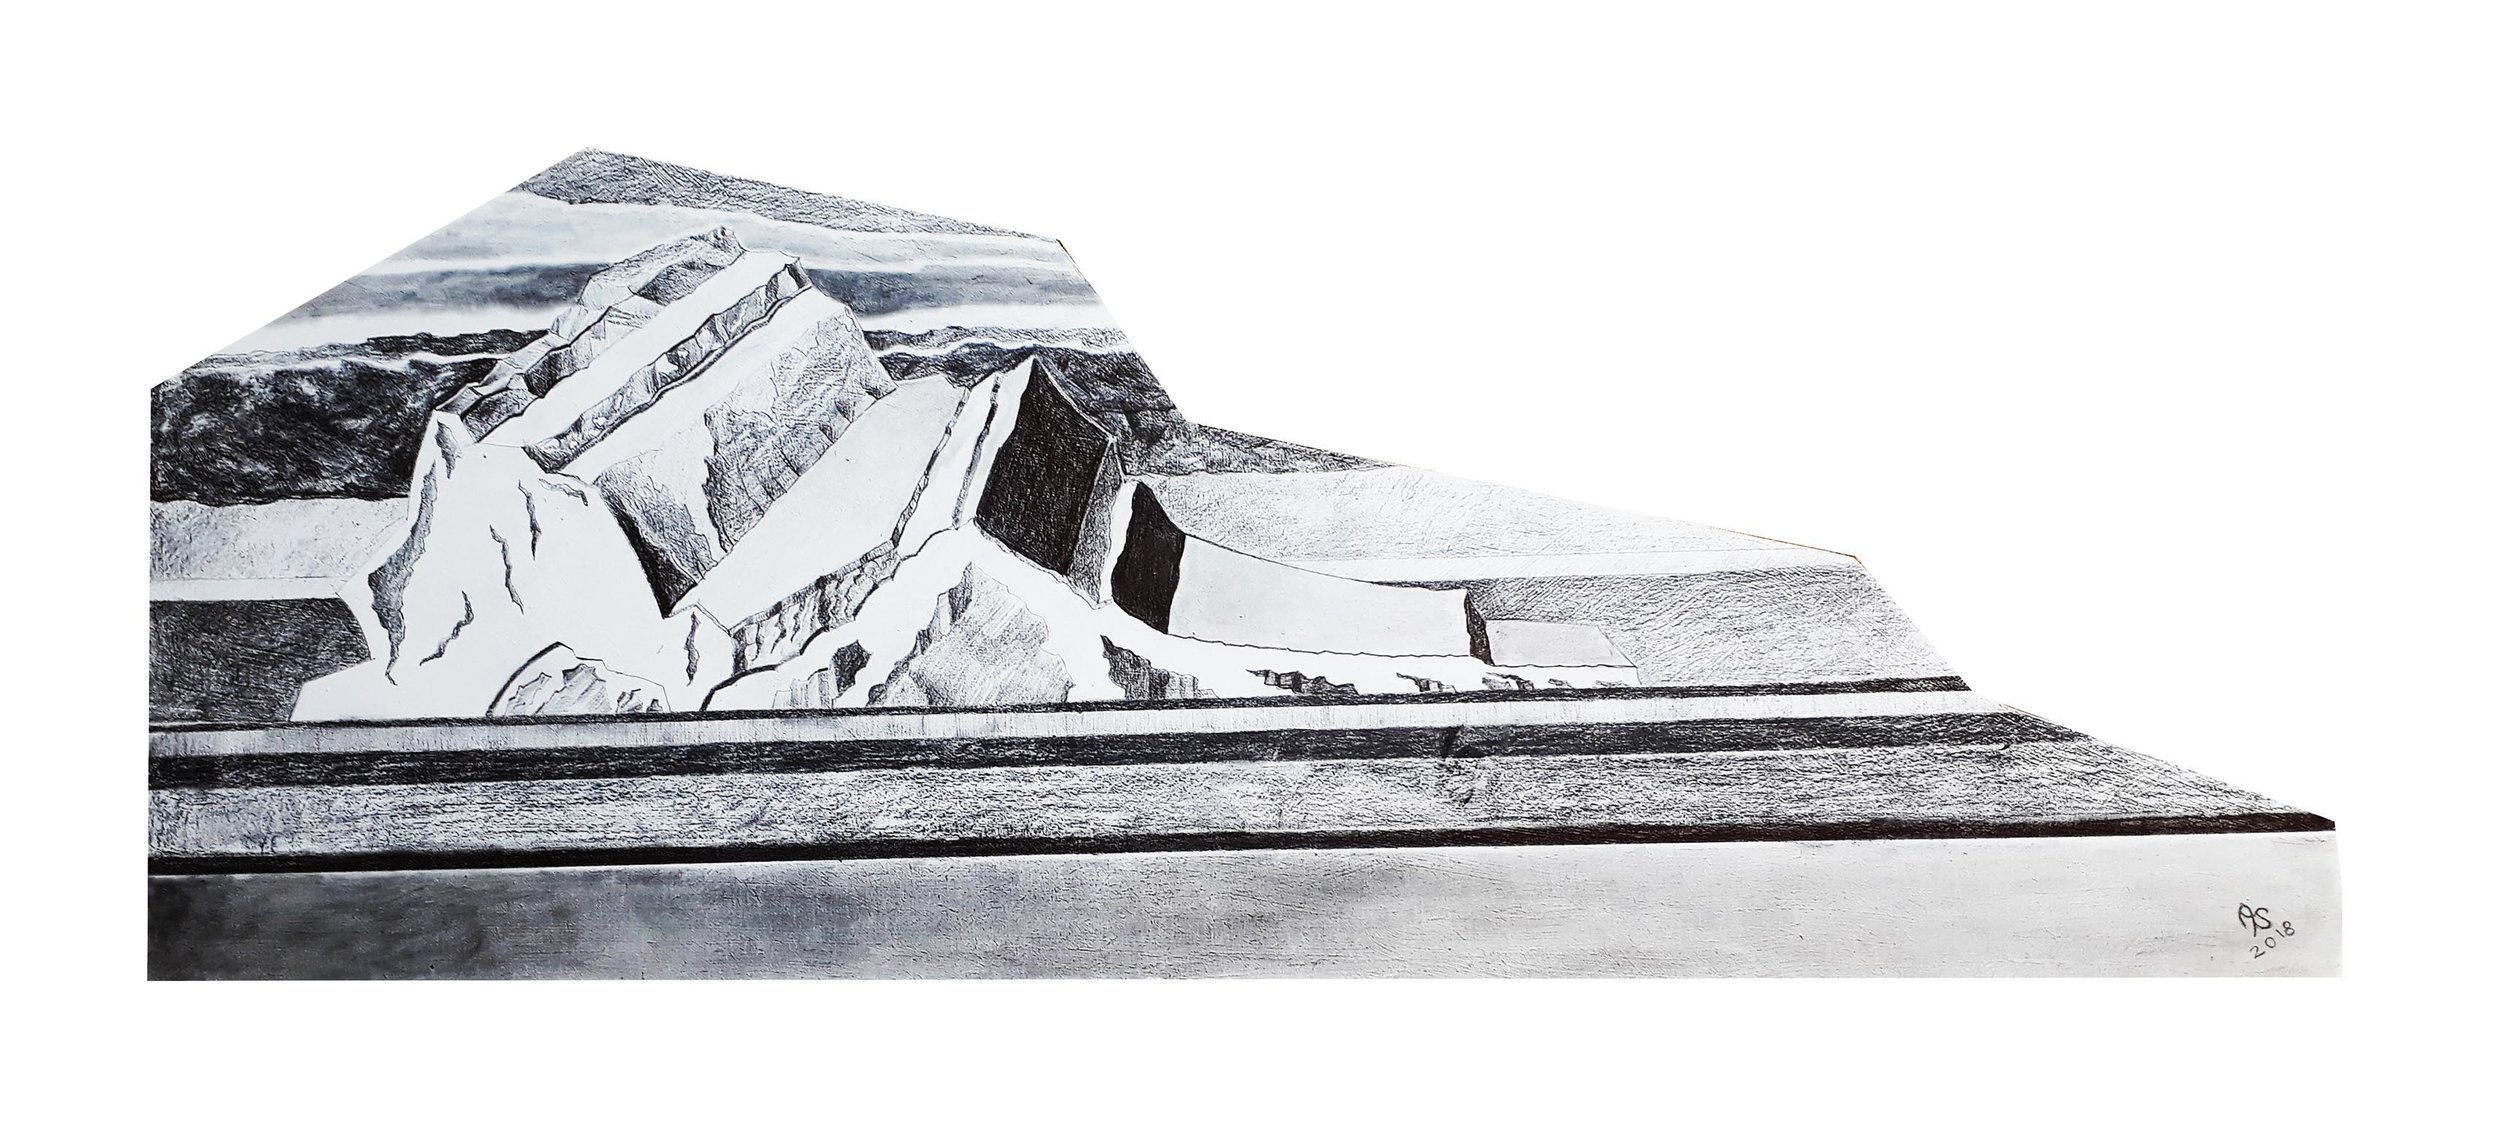 Ellesmere Island Iceberg, 2018, Graphite on MDF, 32 cm x 80 cm $125 + postage